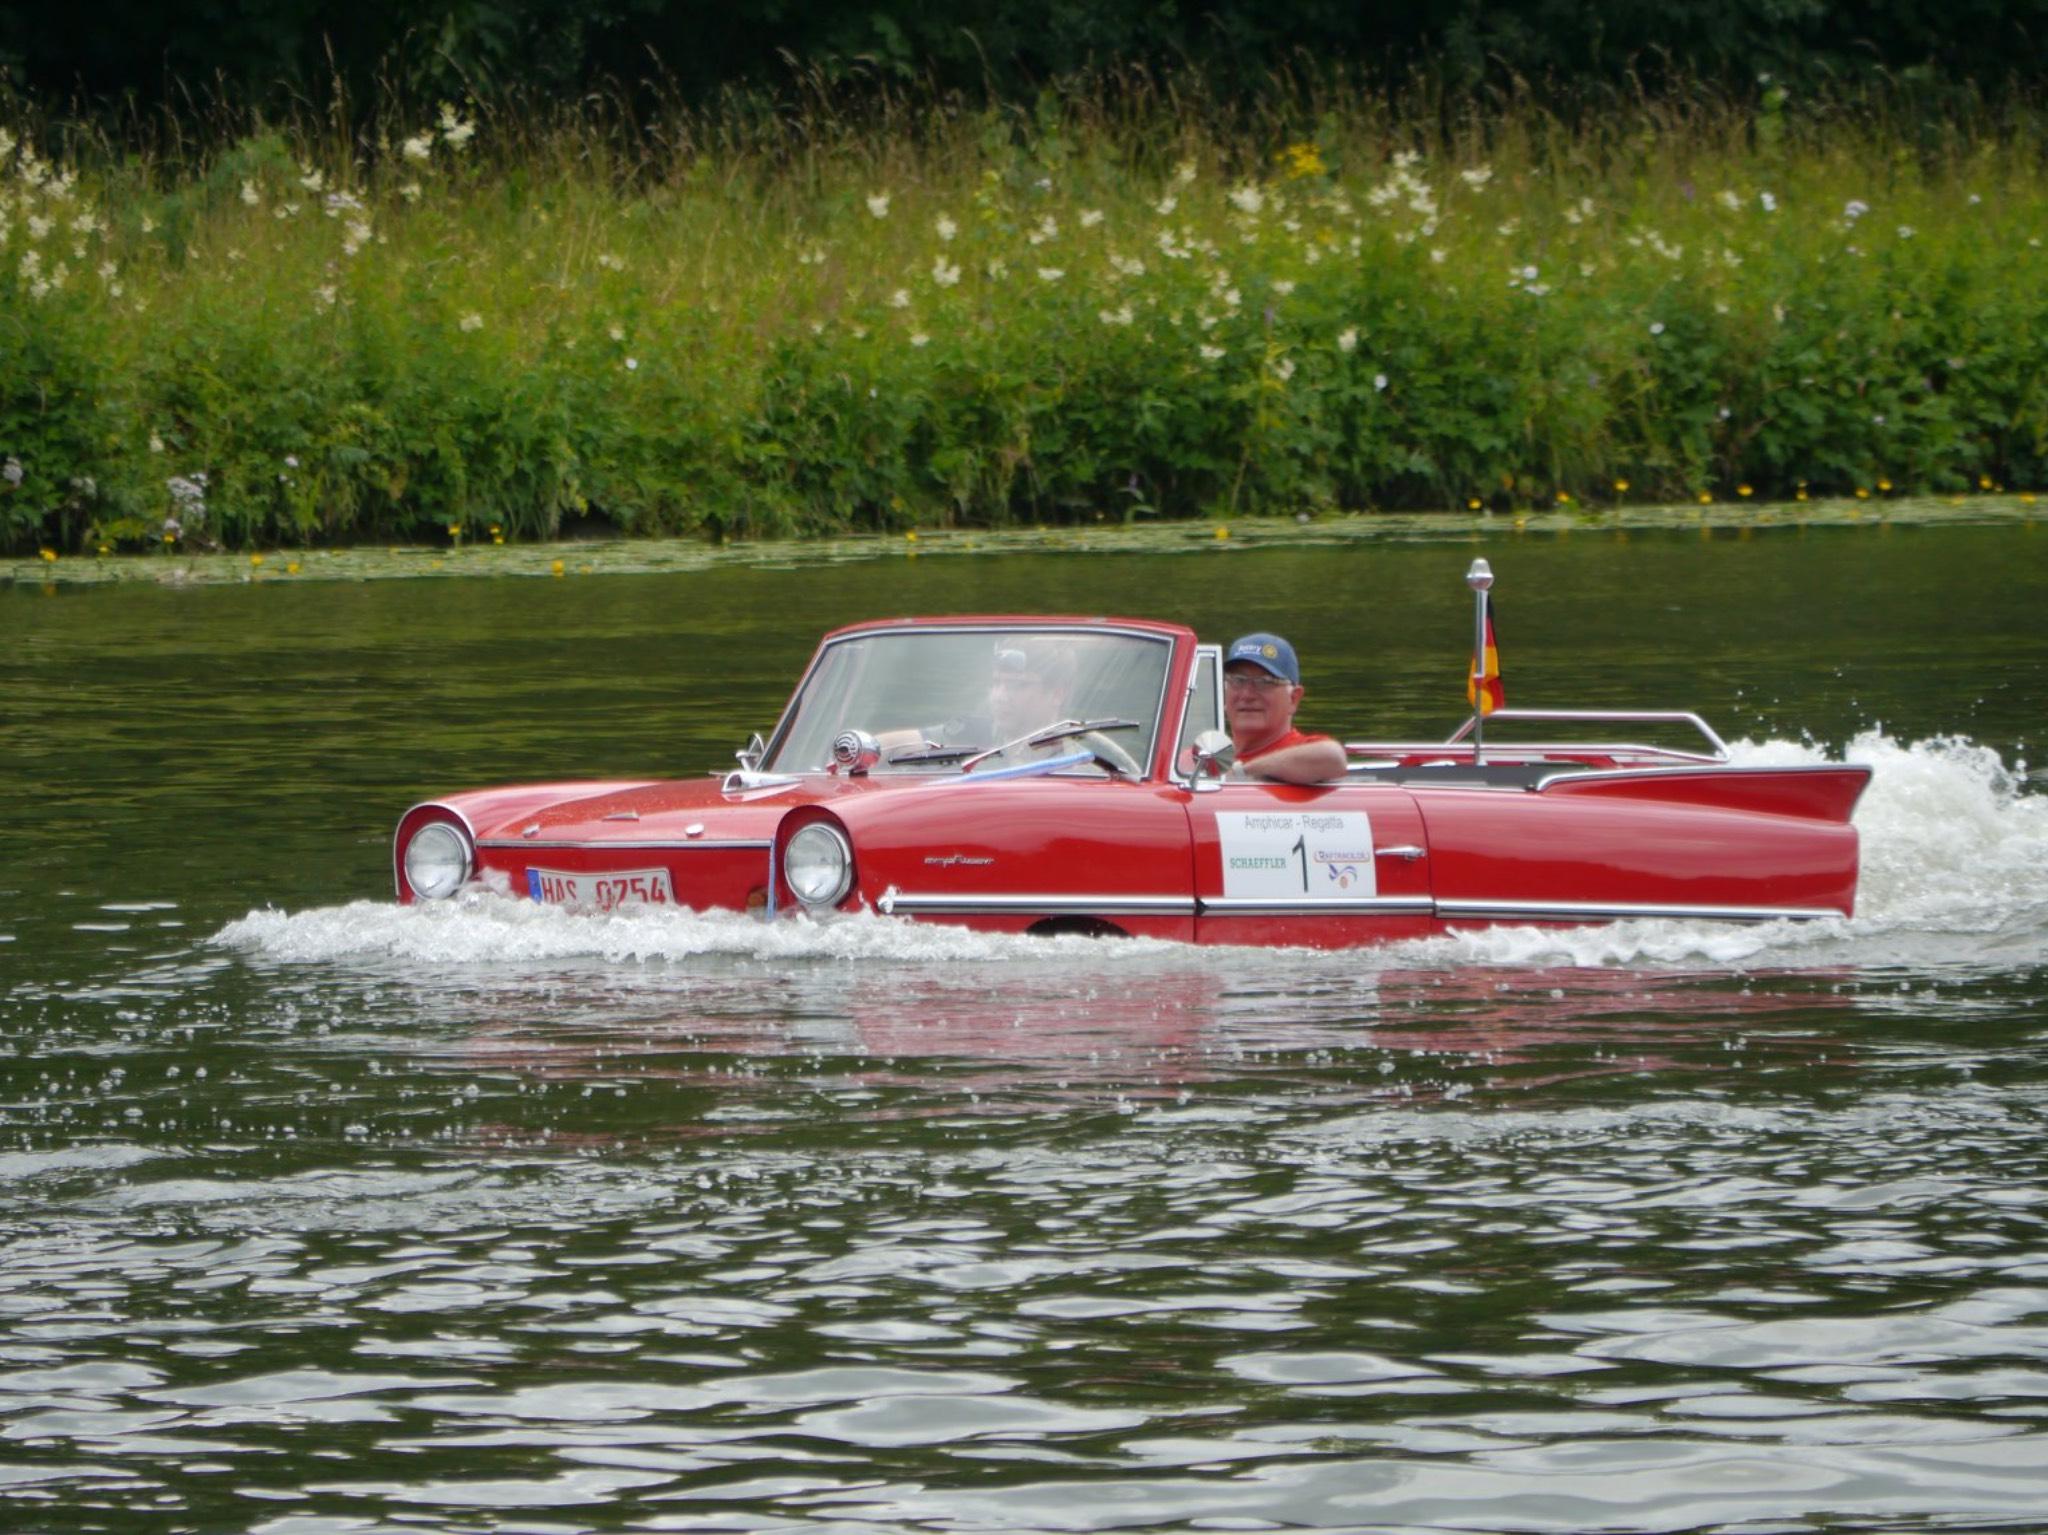 Einzigartige Amphicar-Regatta. Foto: Helmut Ziegler